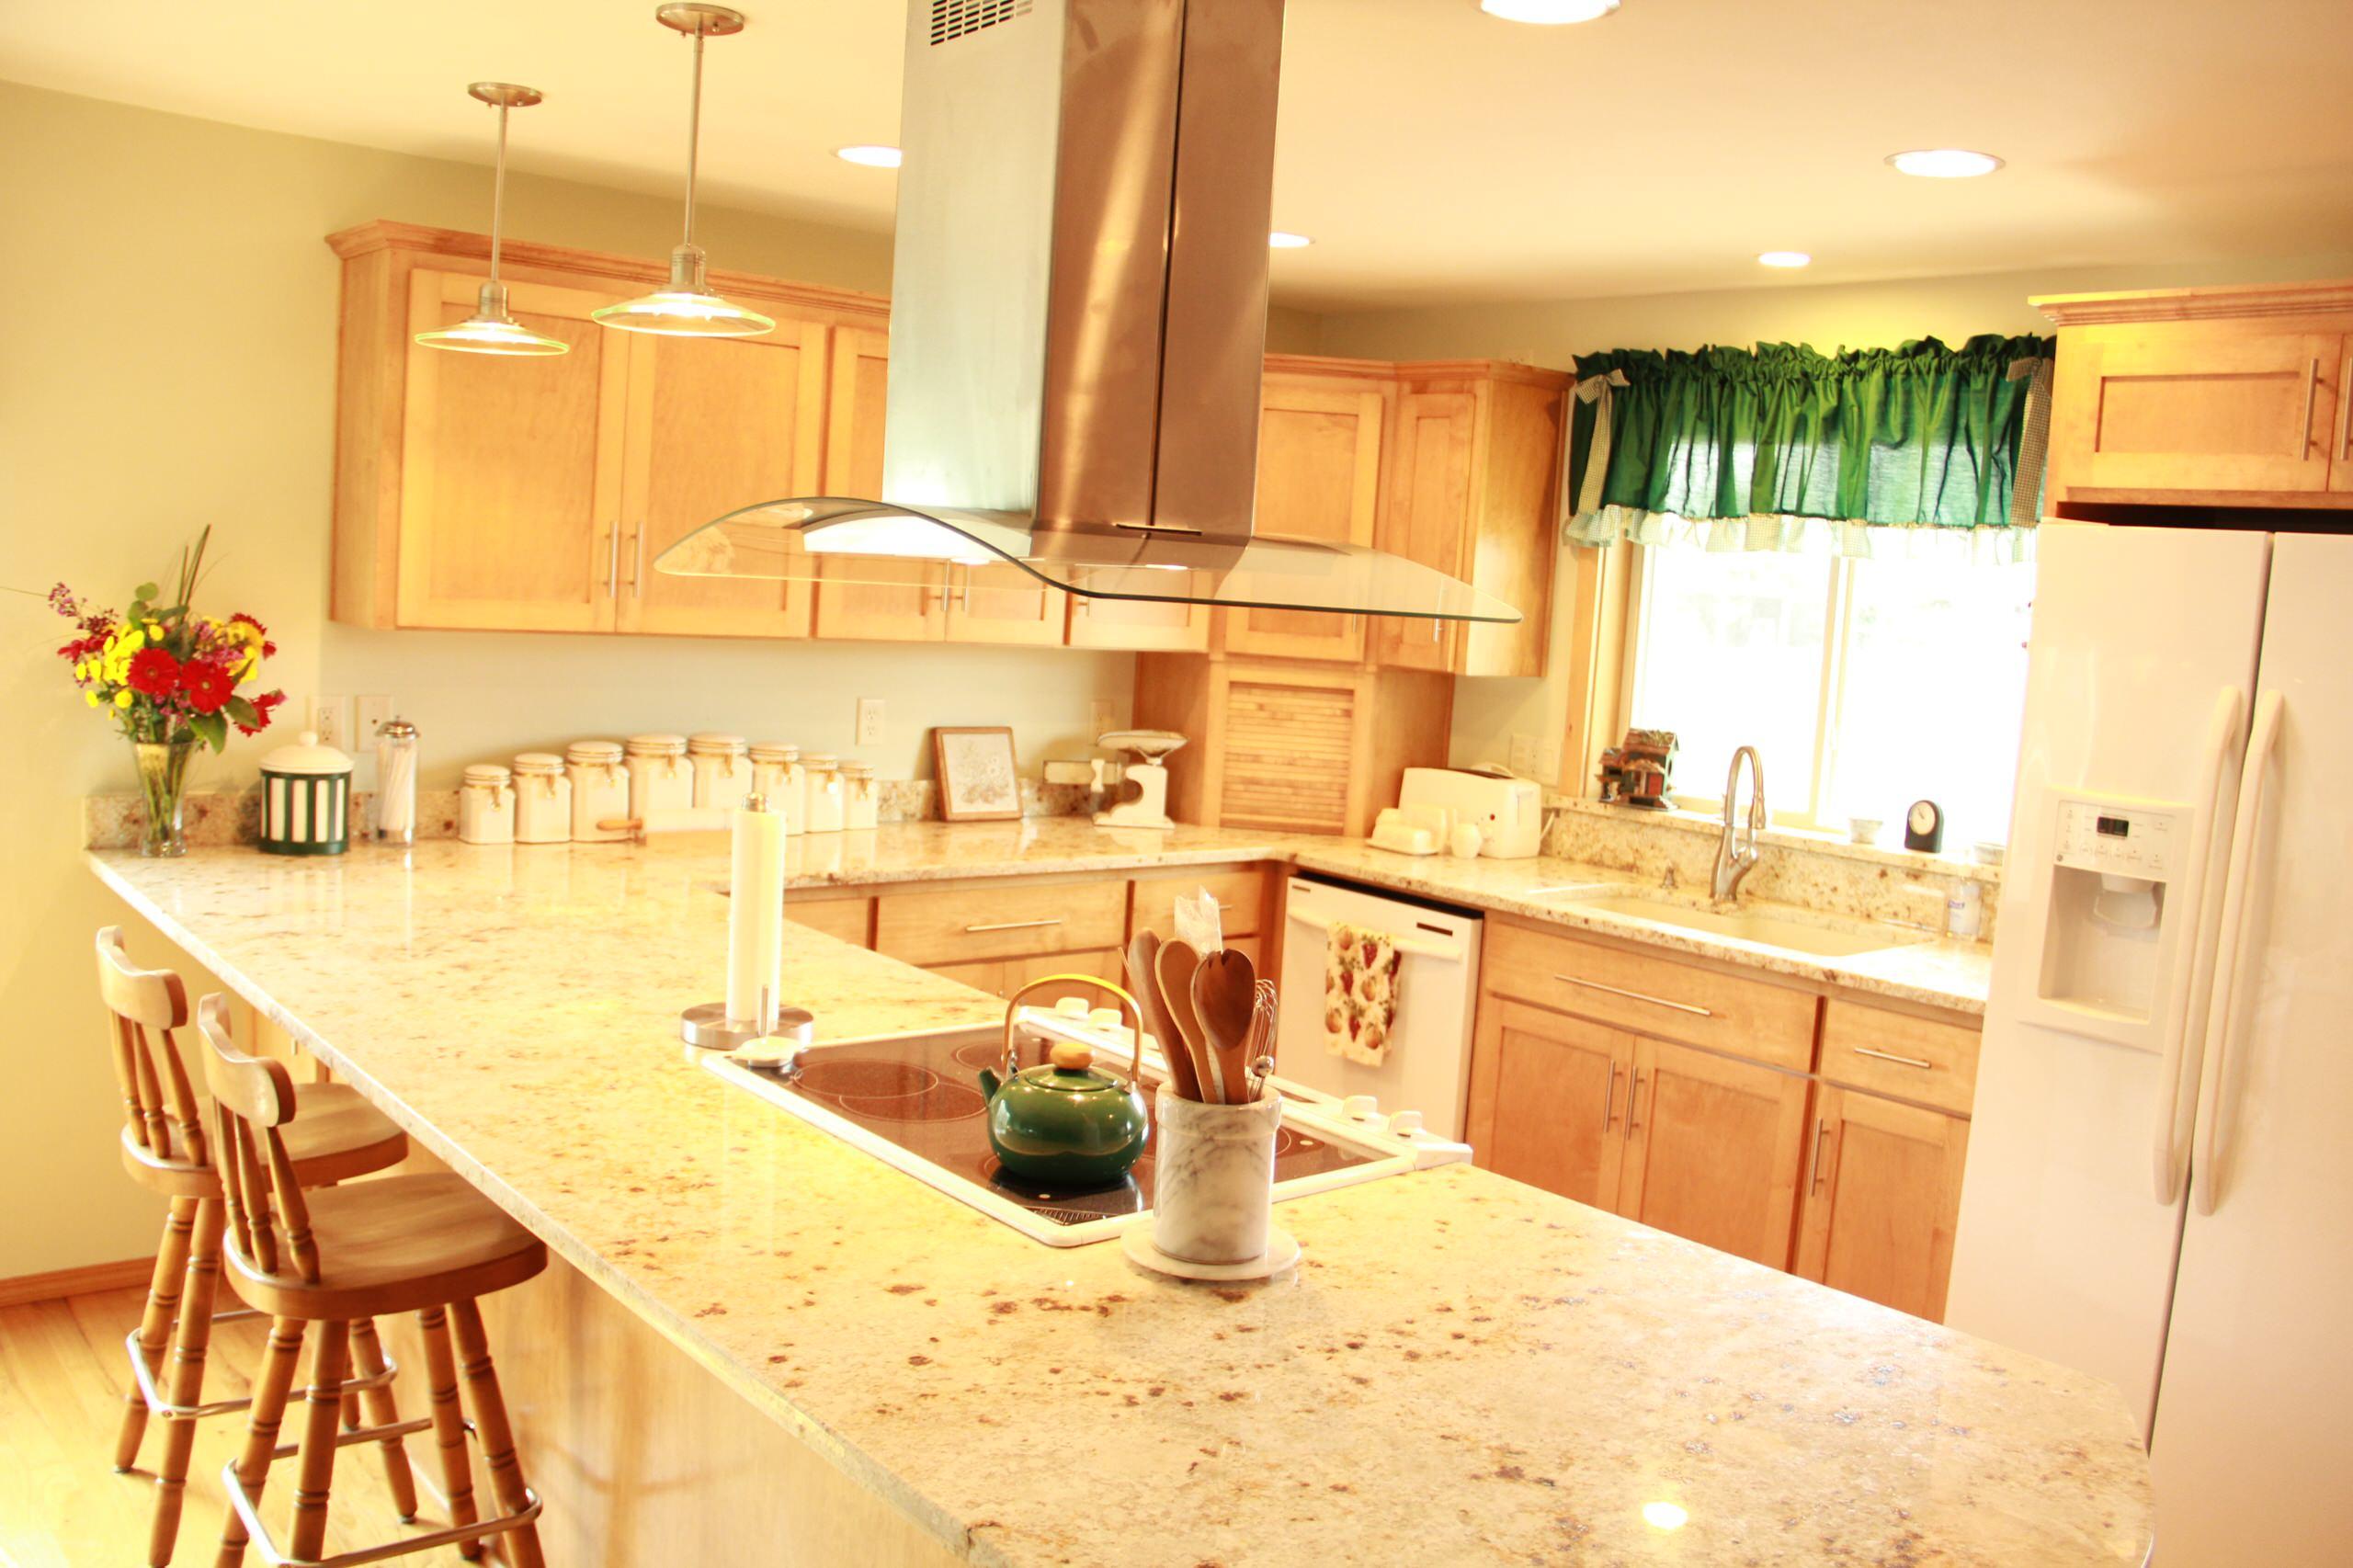 Witt Kitchen Remodel